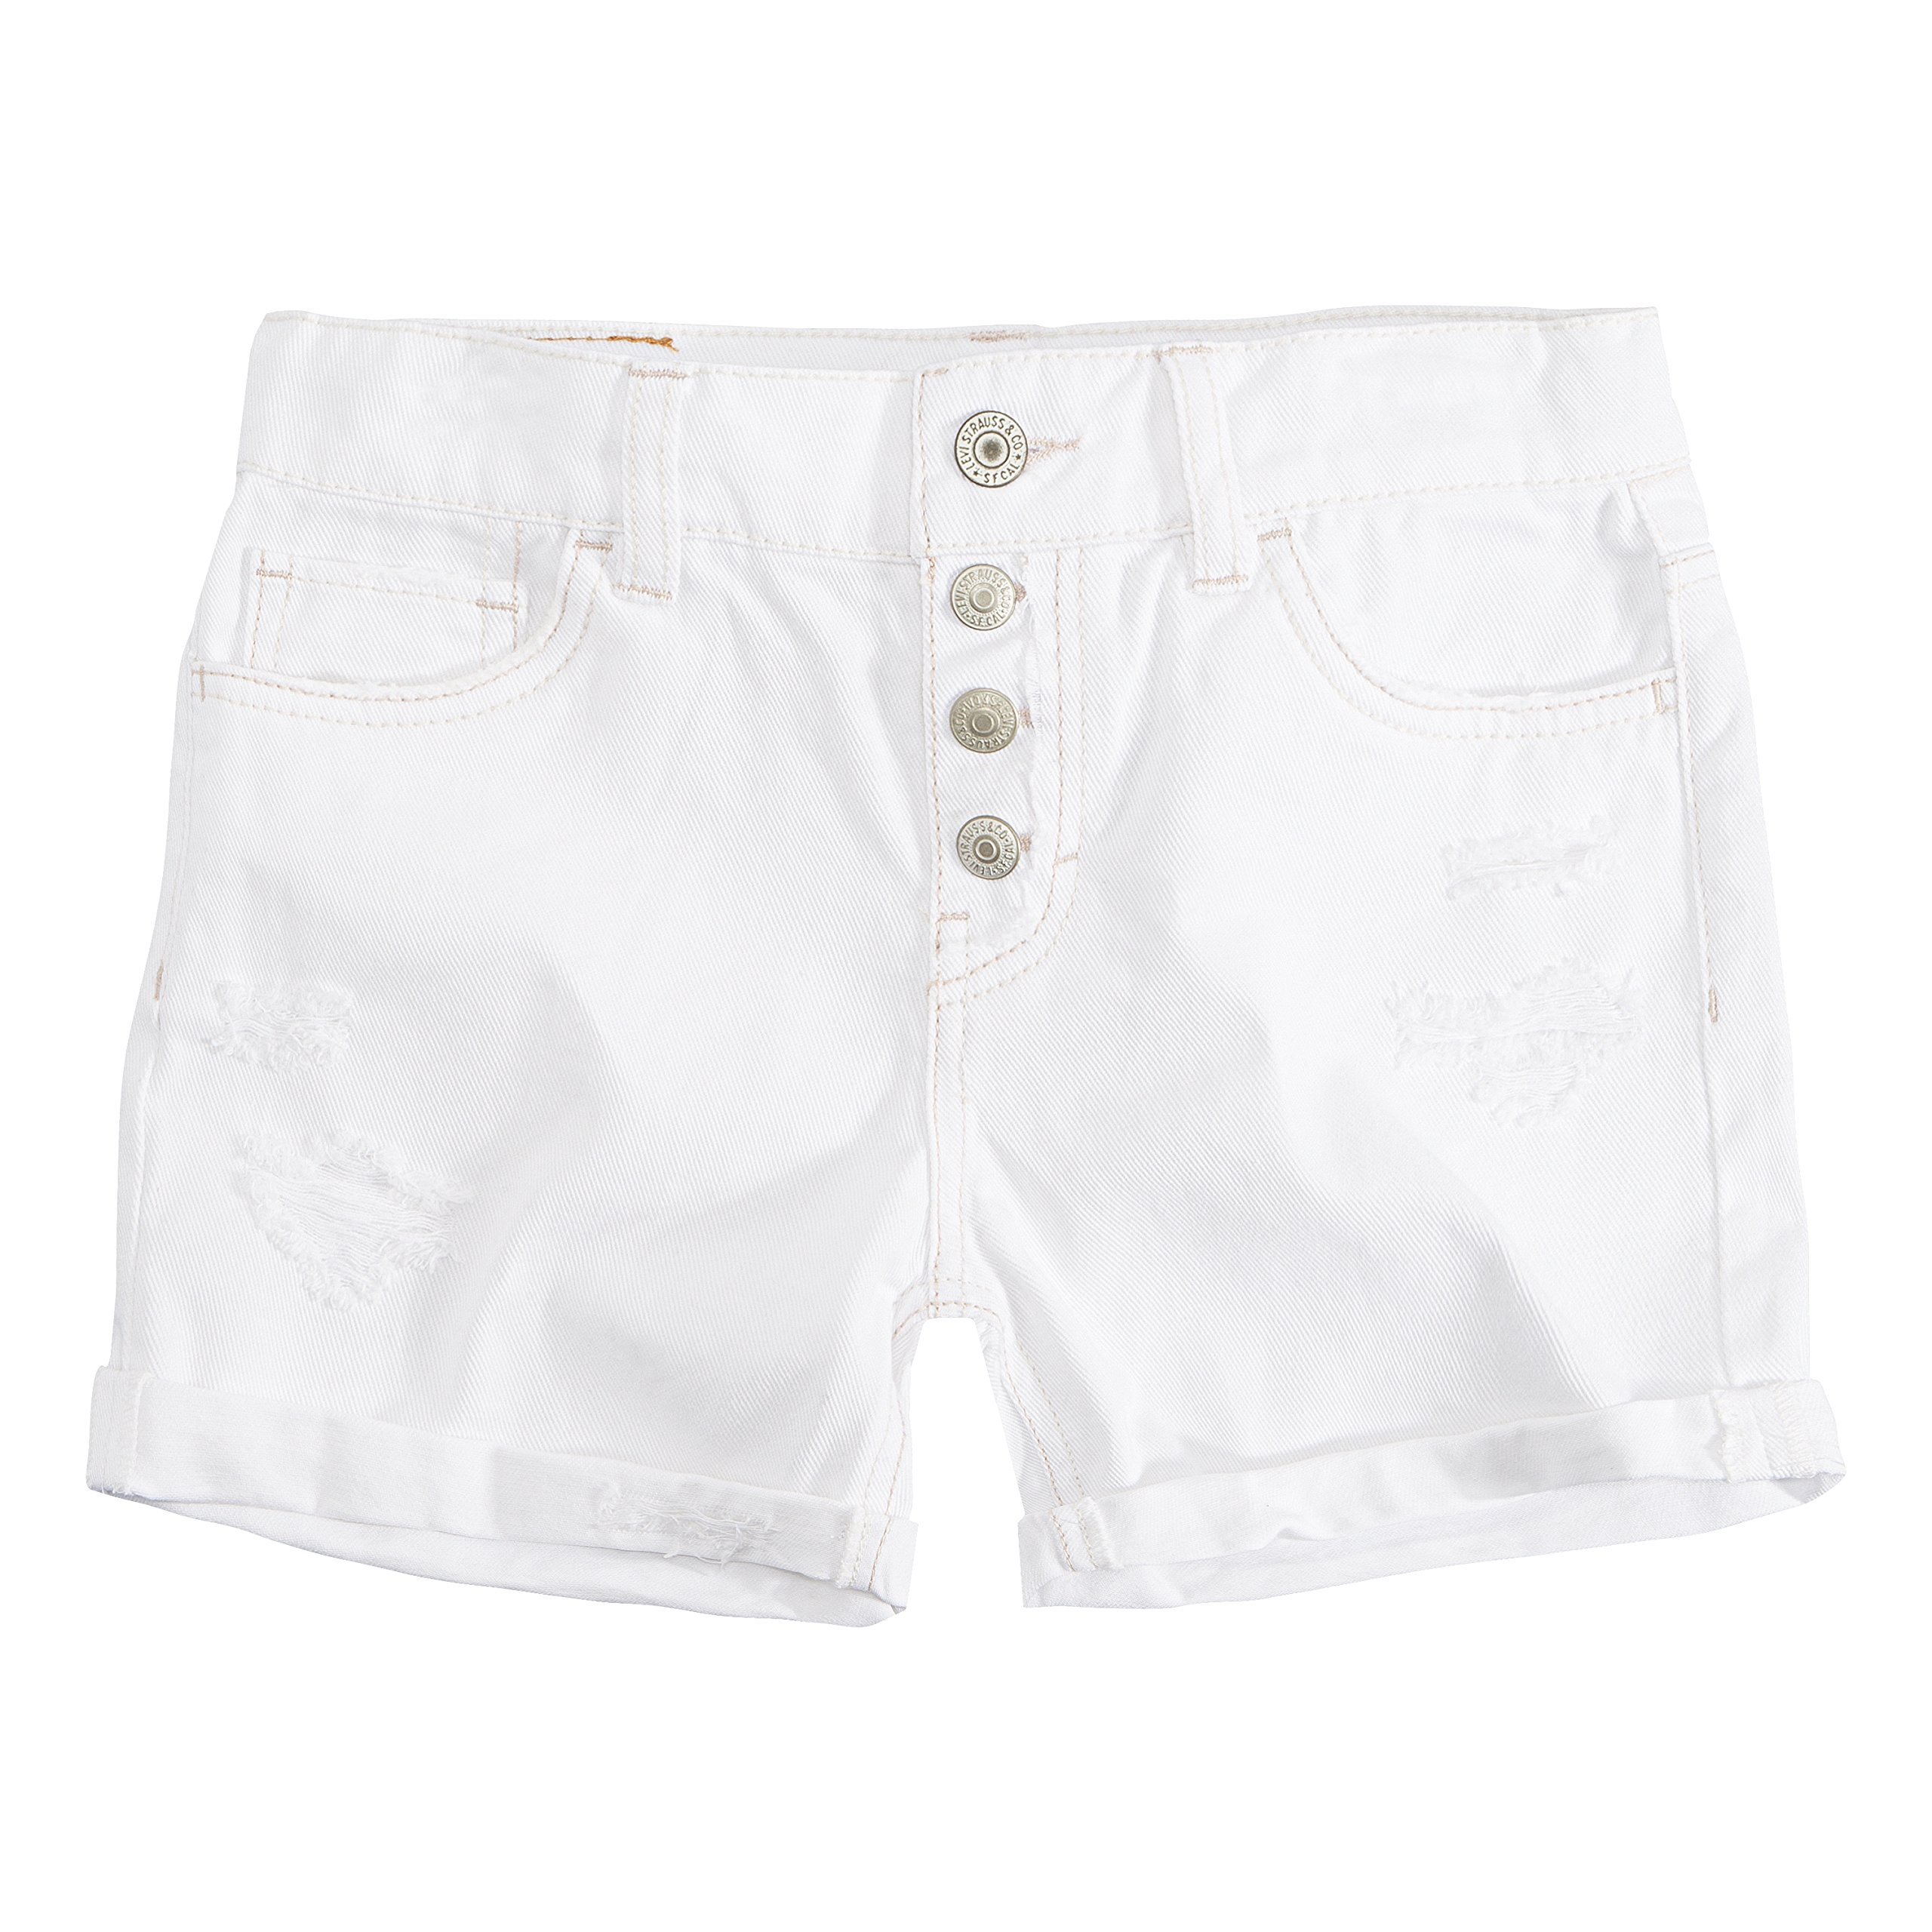 Levi's Big Girls' Girlfriend Fit Shorty Shorts, White, 12